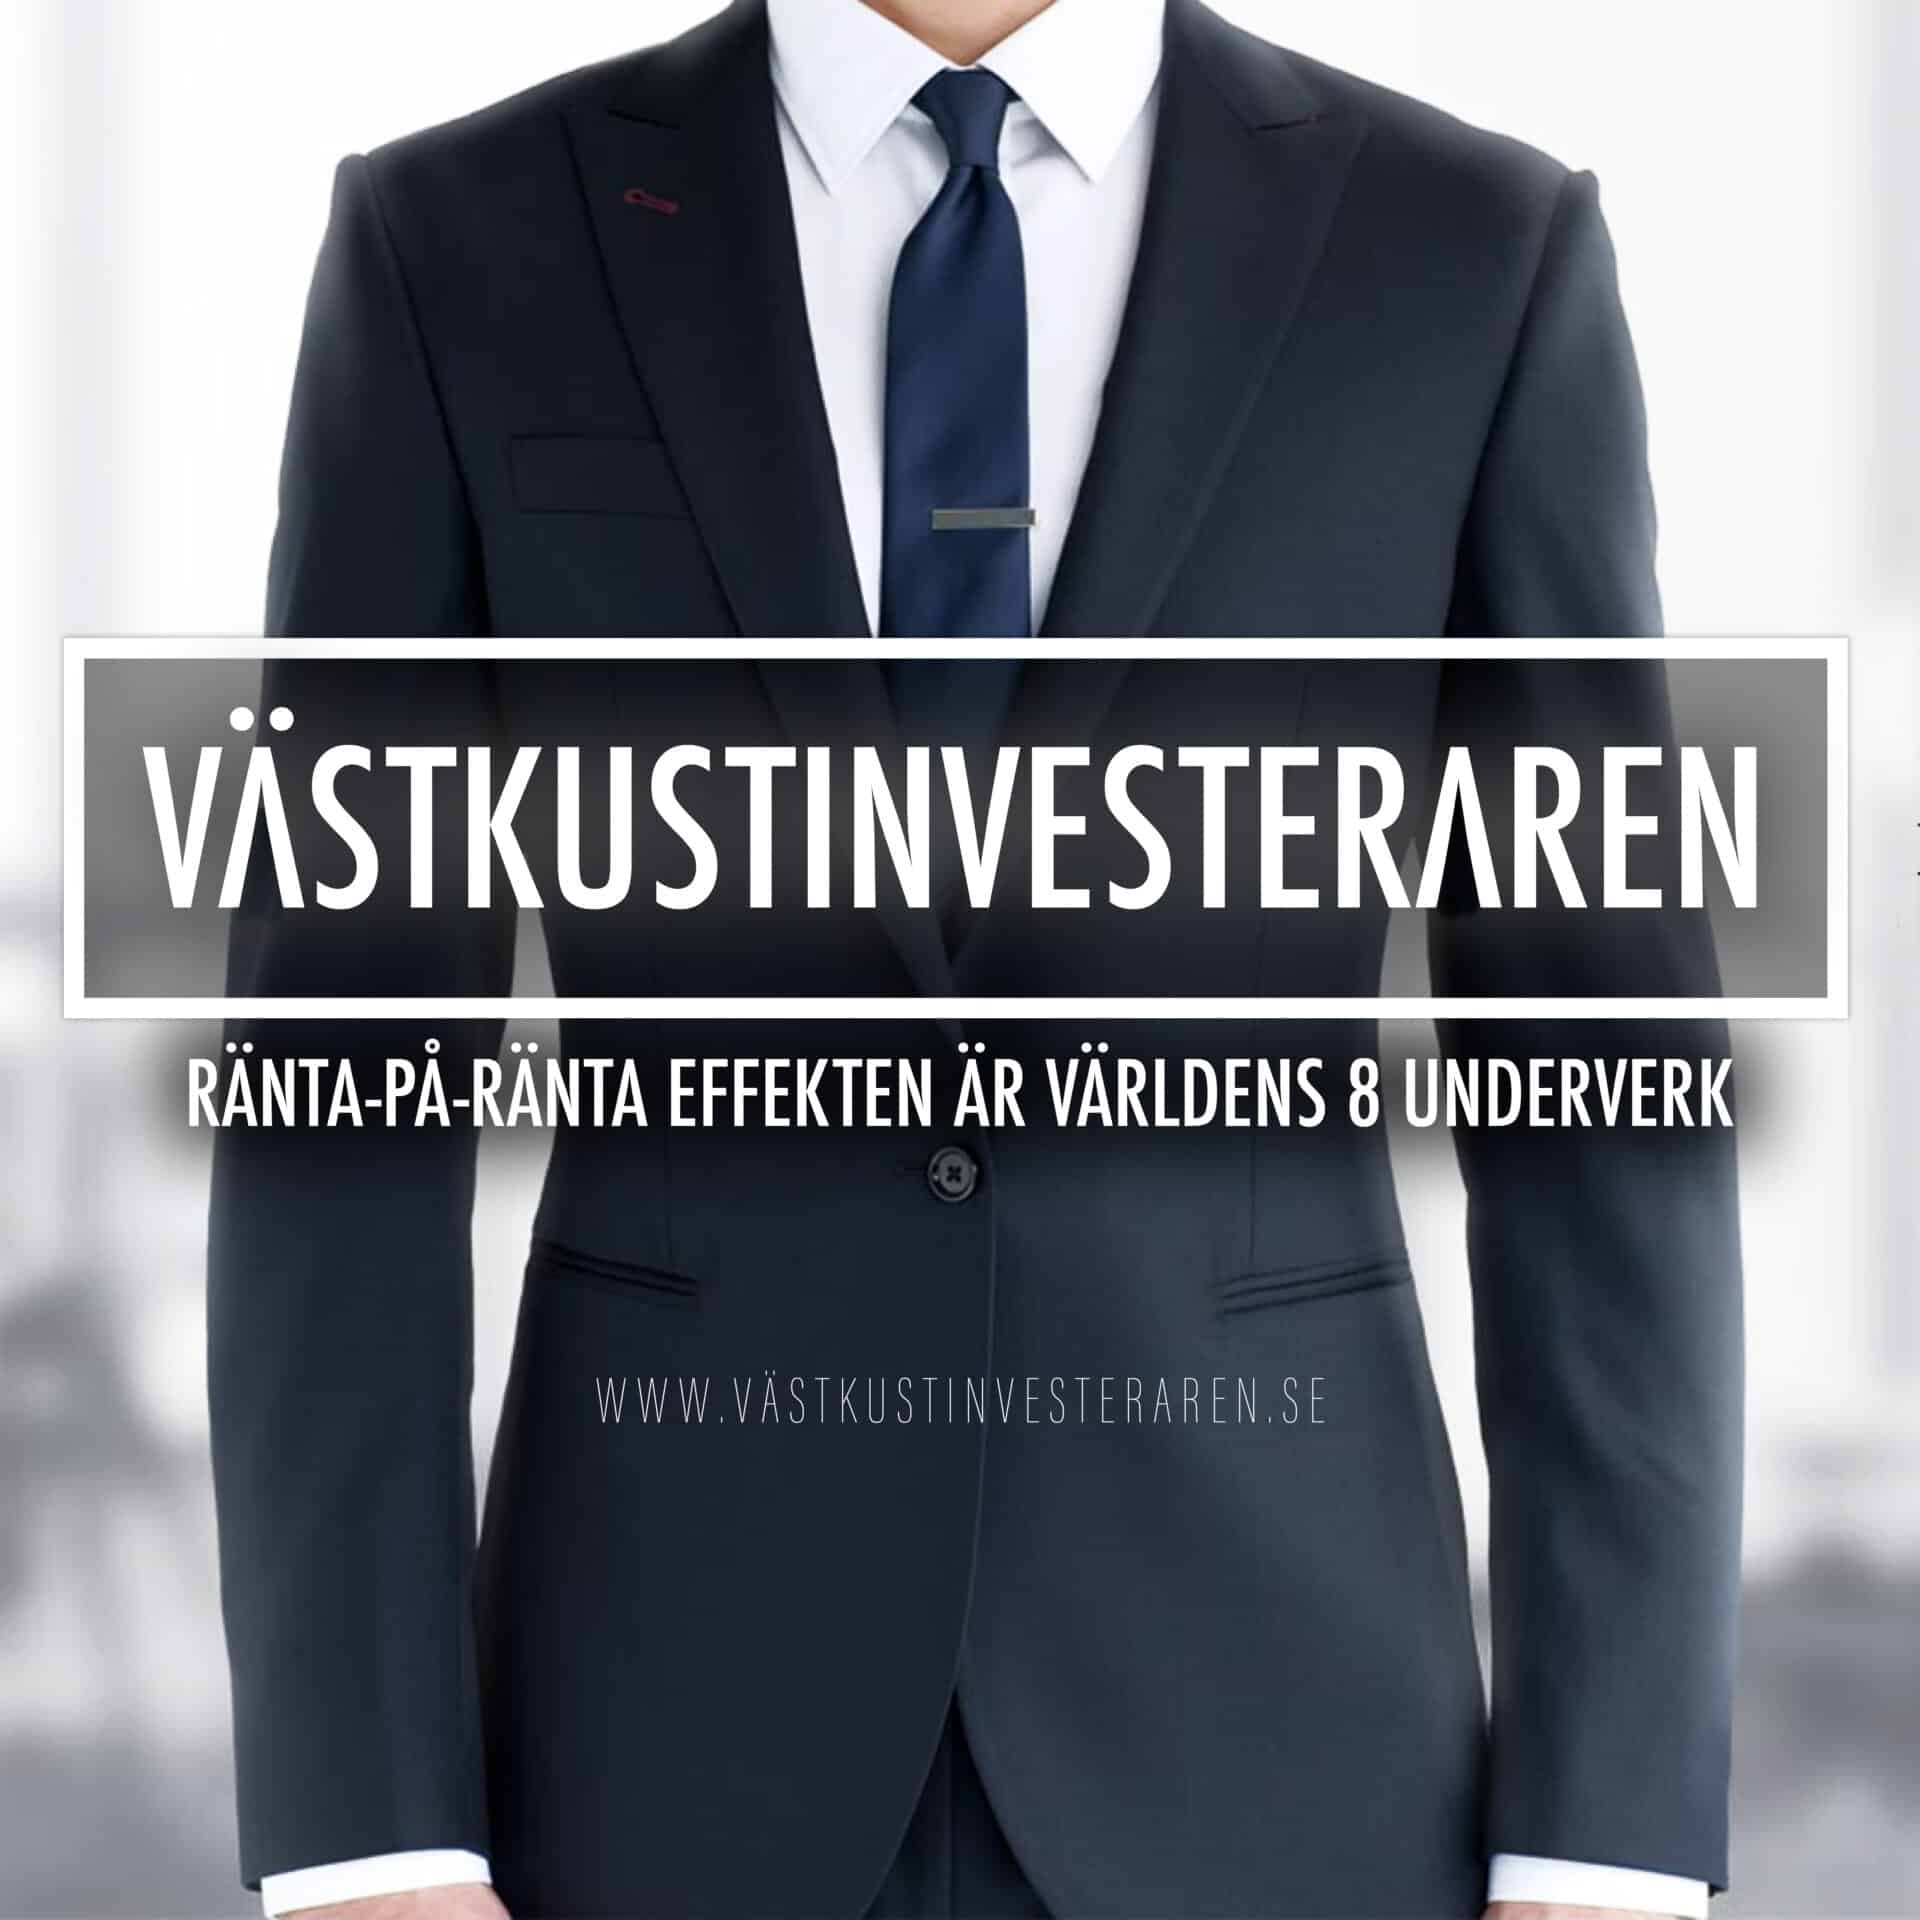 västkustinvesteraren-profilbild